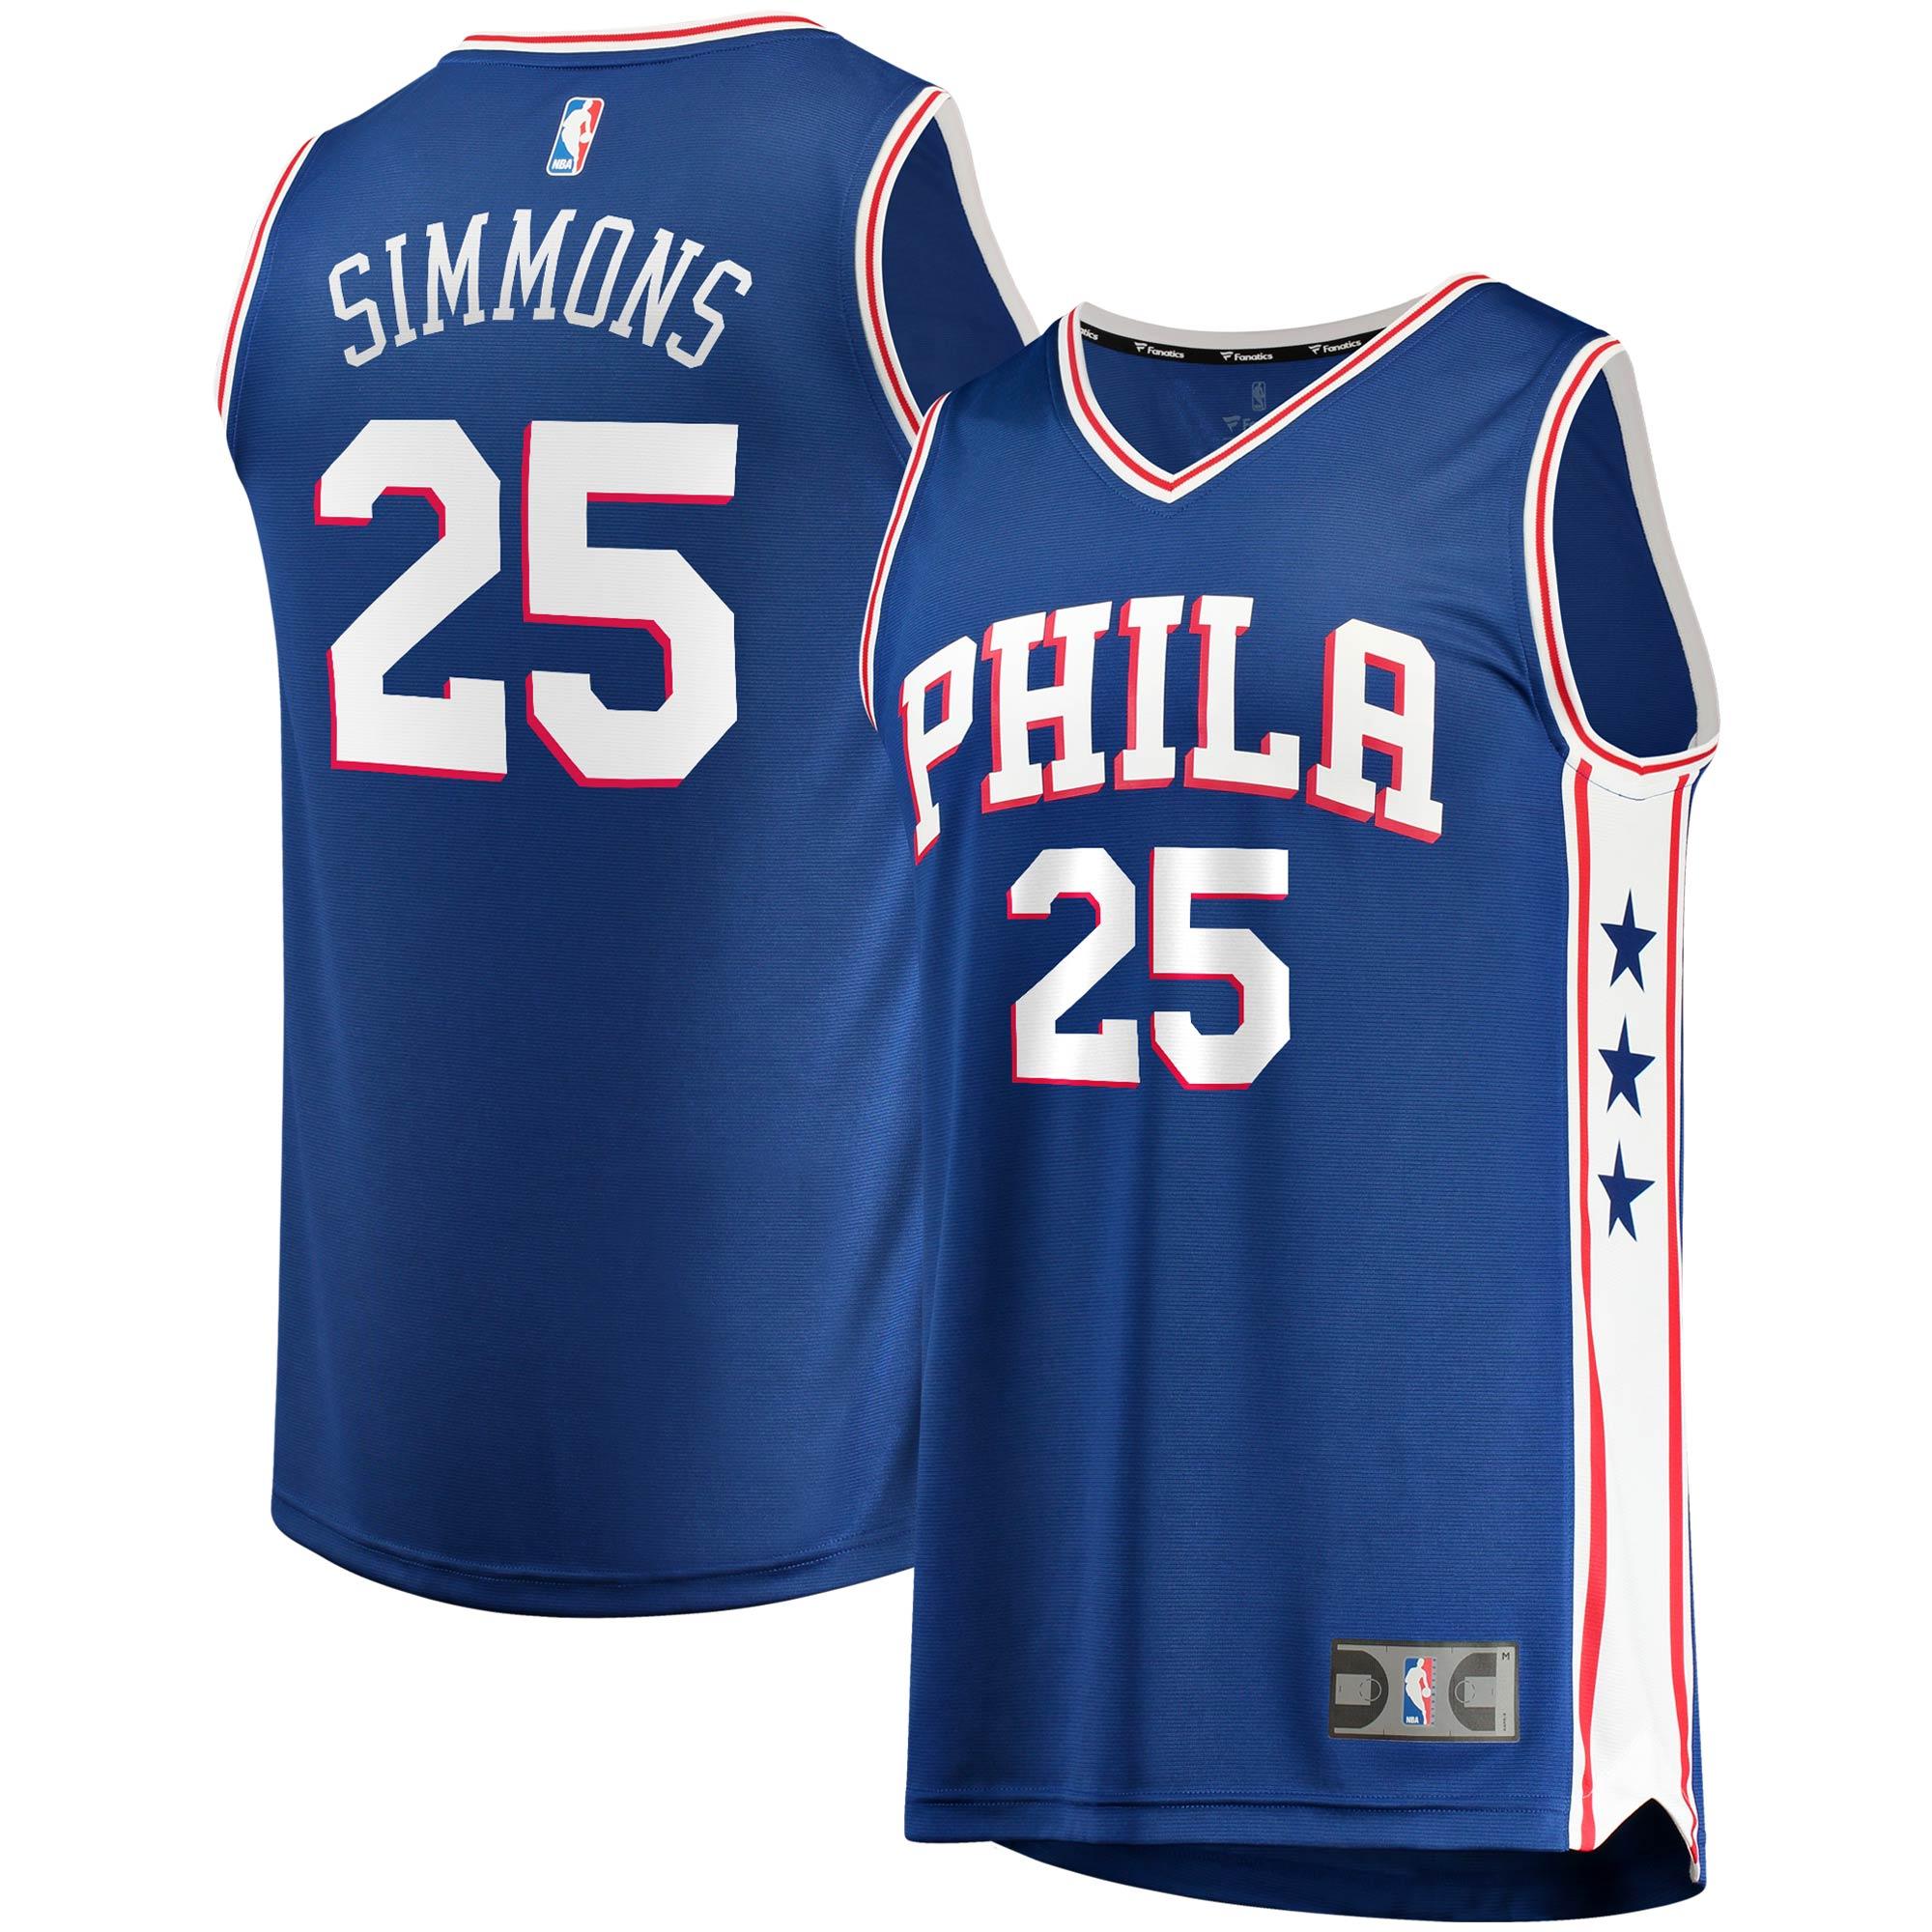 Ben Simmons Philadelphia 76ers Fanatics Branded Youth 2019/20 Fast Break Replica Jersey - Icon Edition - Royal